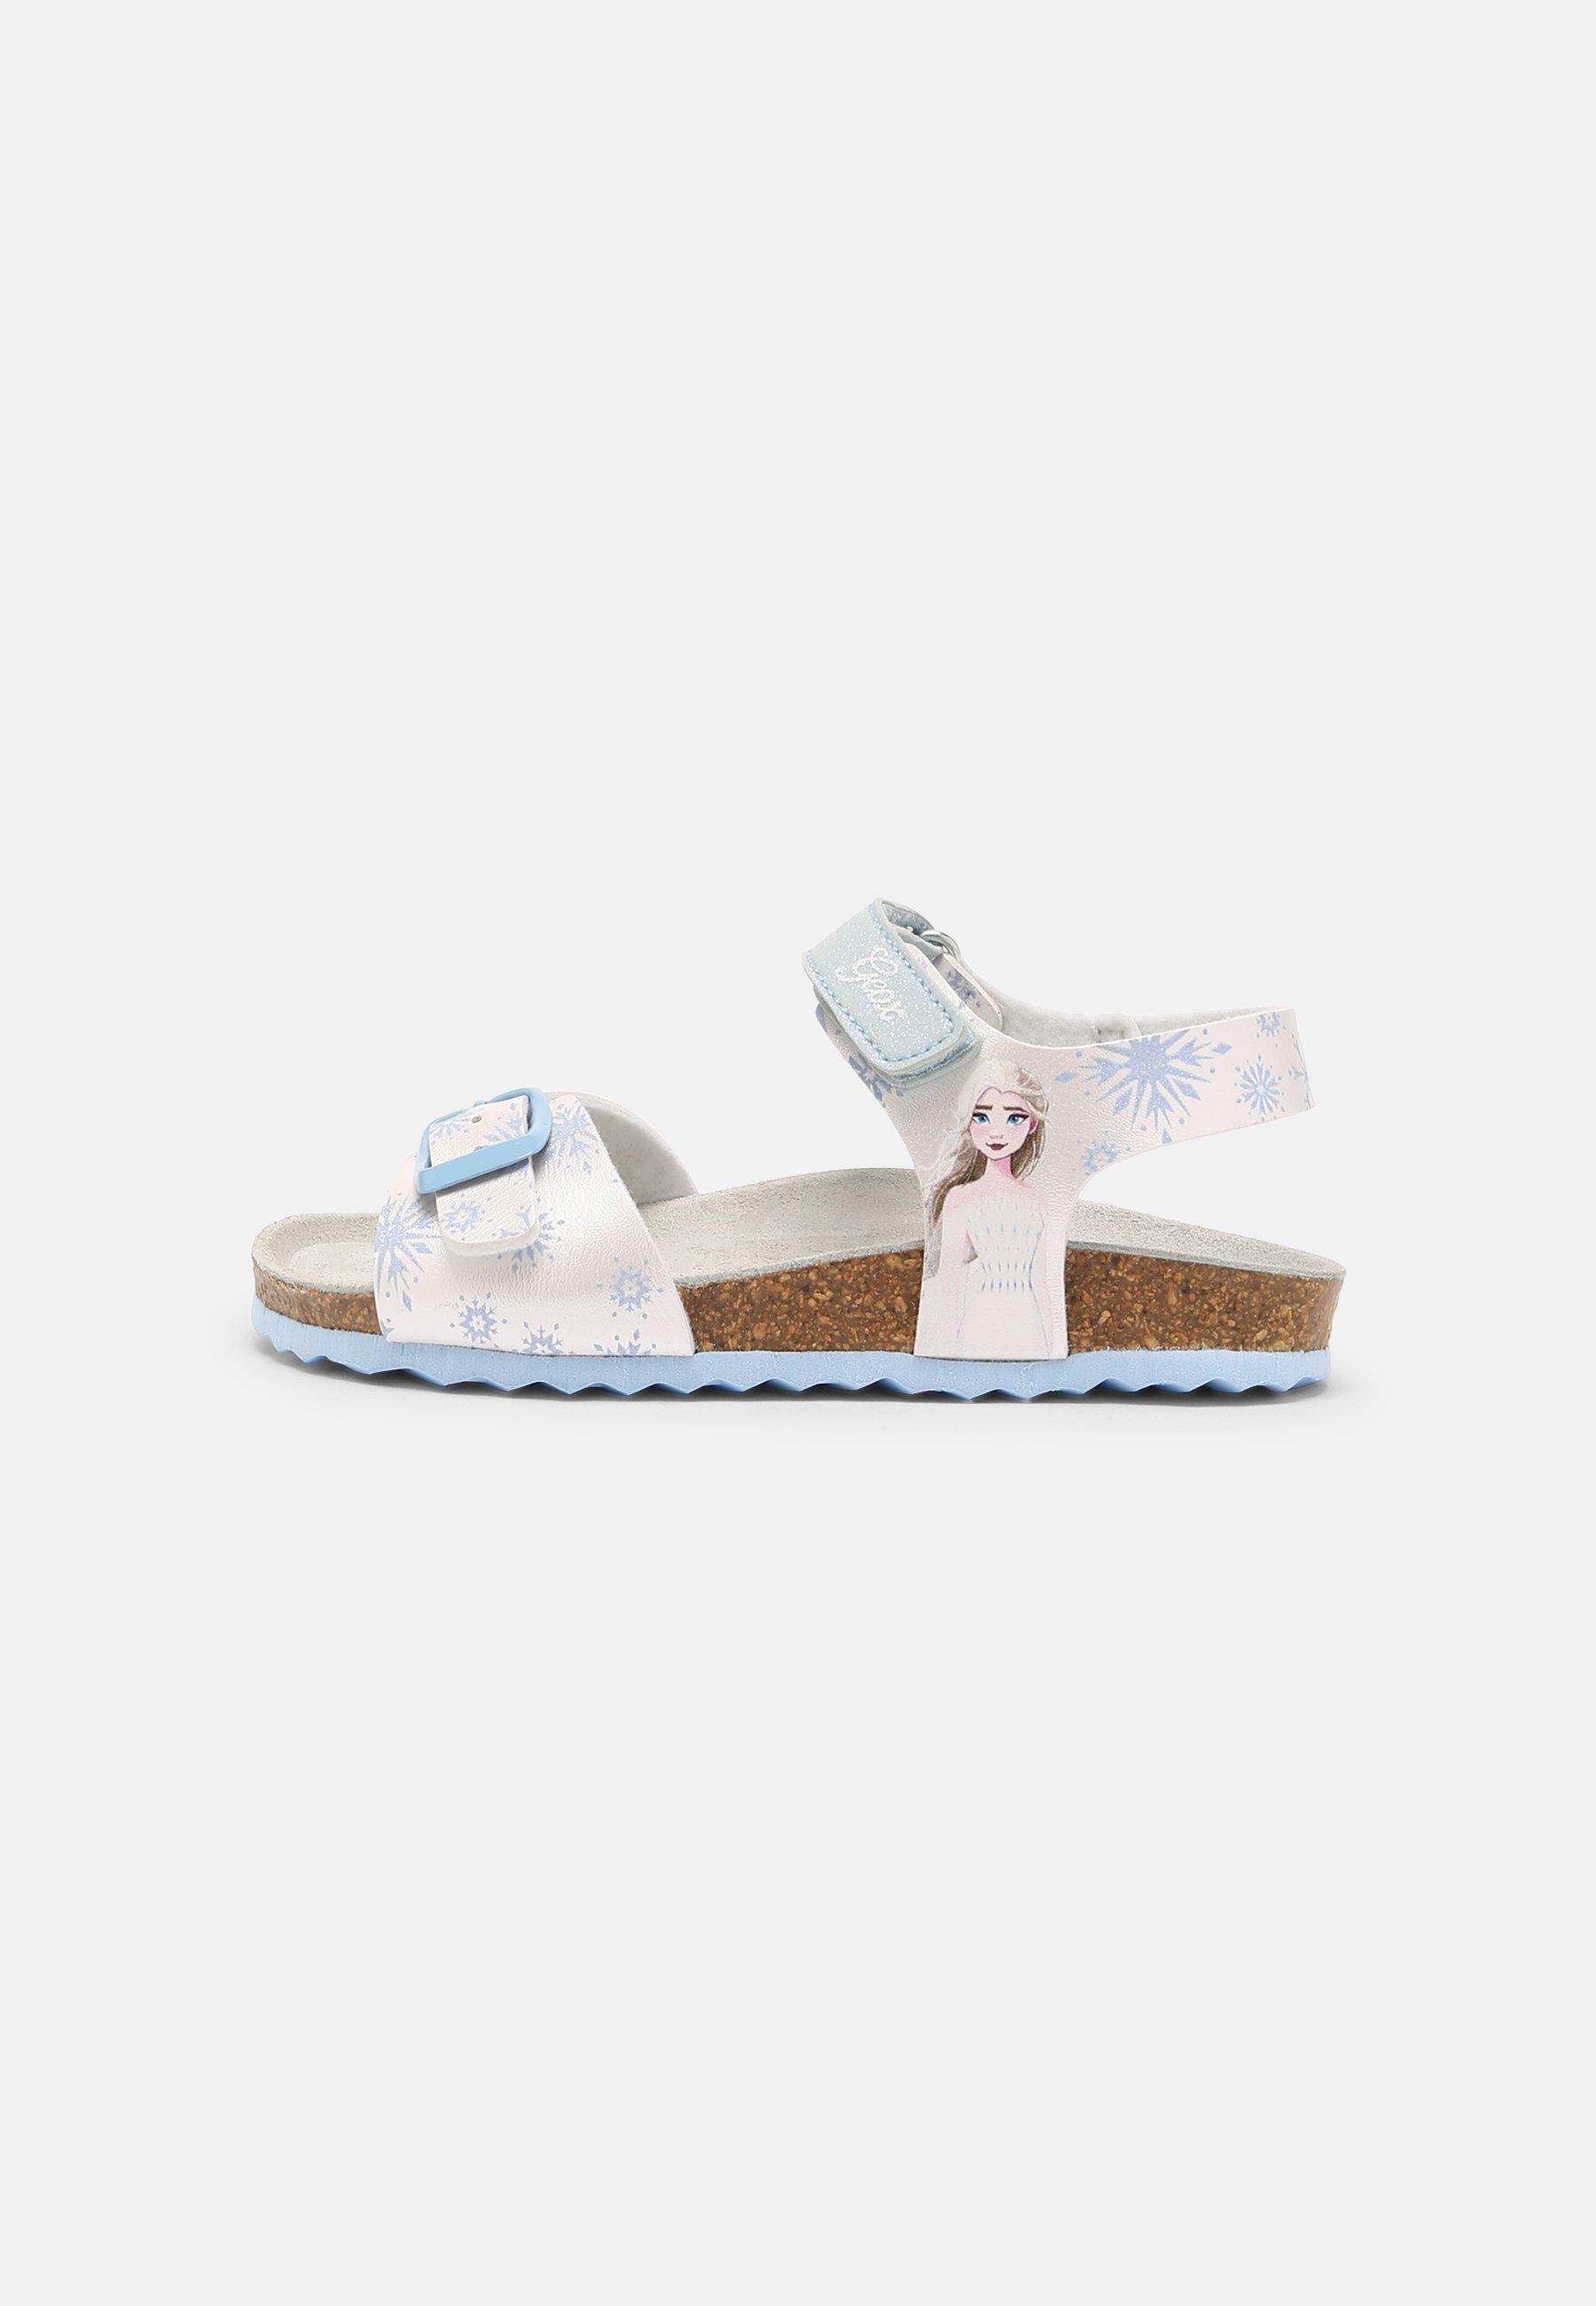 Kids ADRIEL DISNEY FROZENGIRL GEOX - Sandals - Sandals